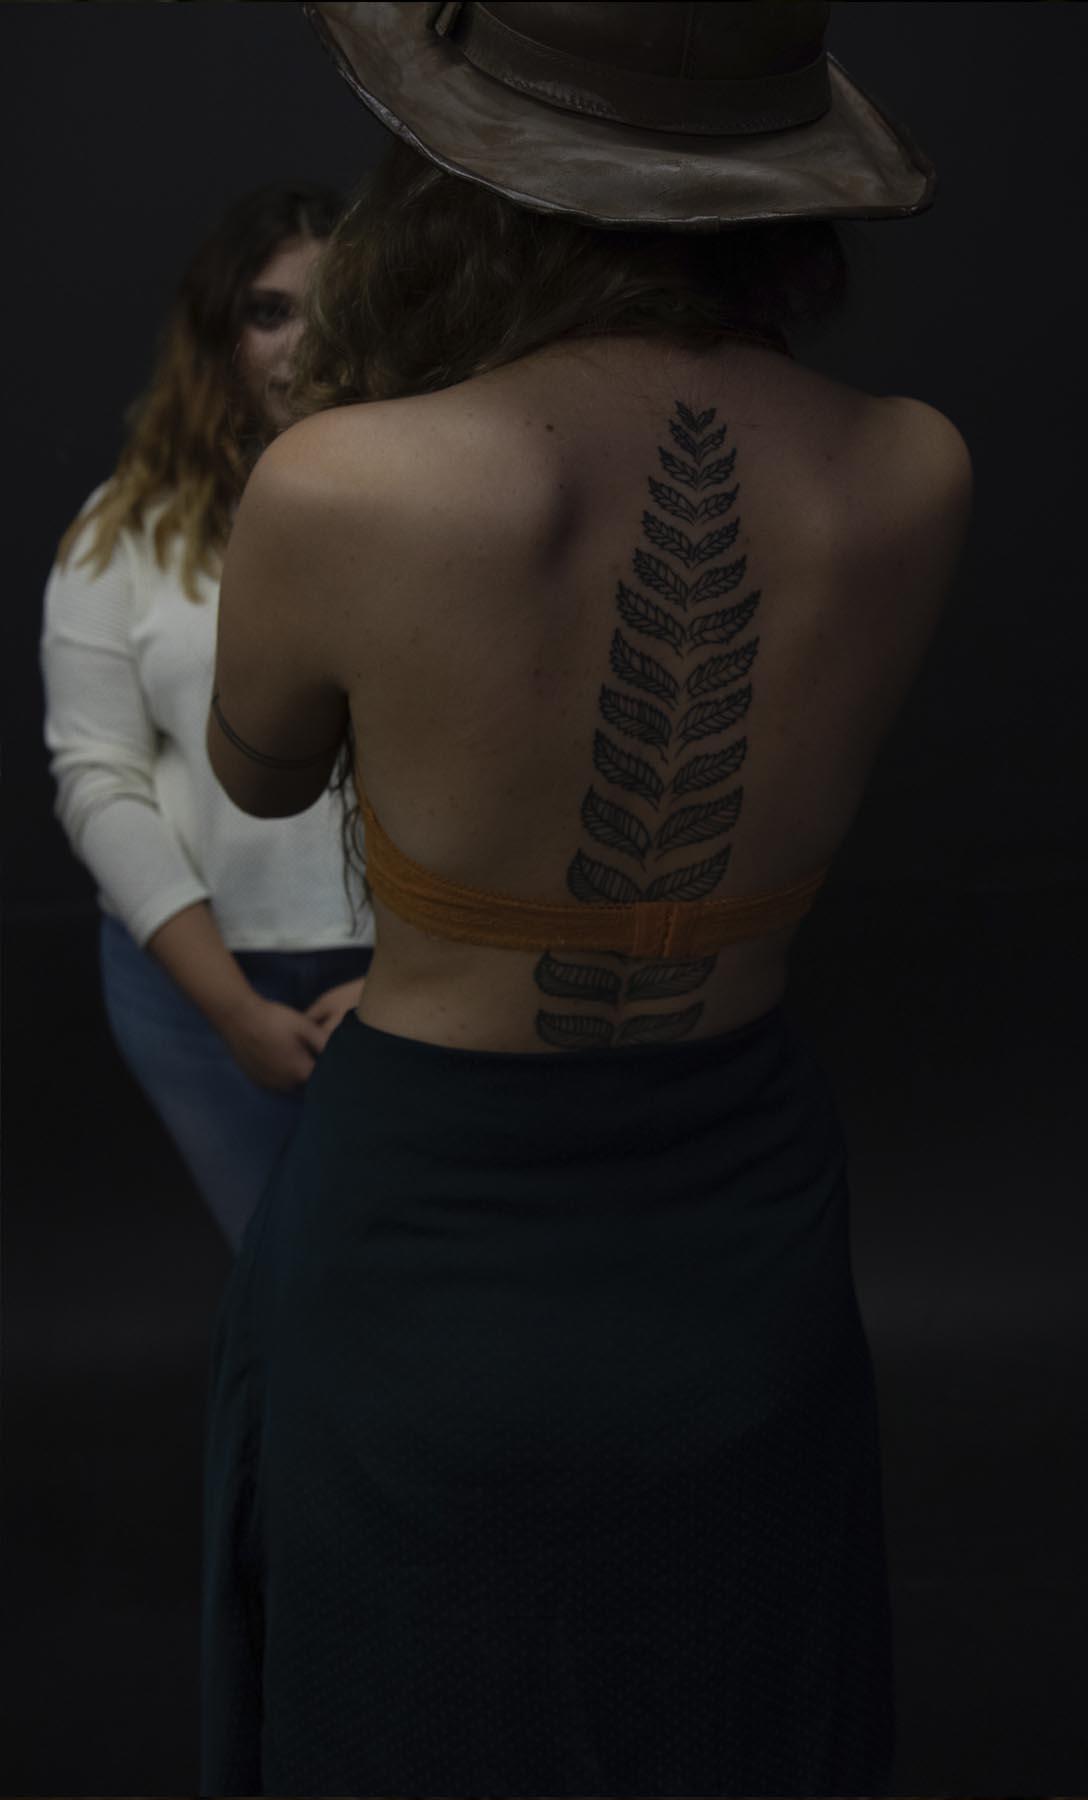 large back tattoo woman.jpg